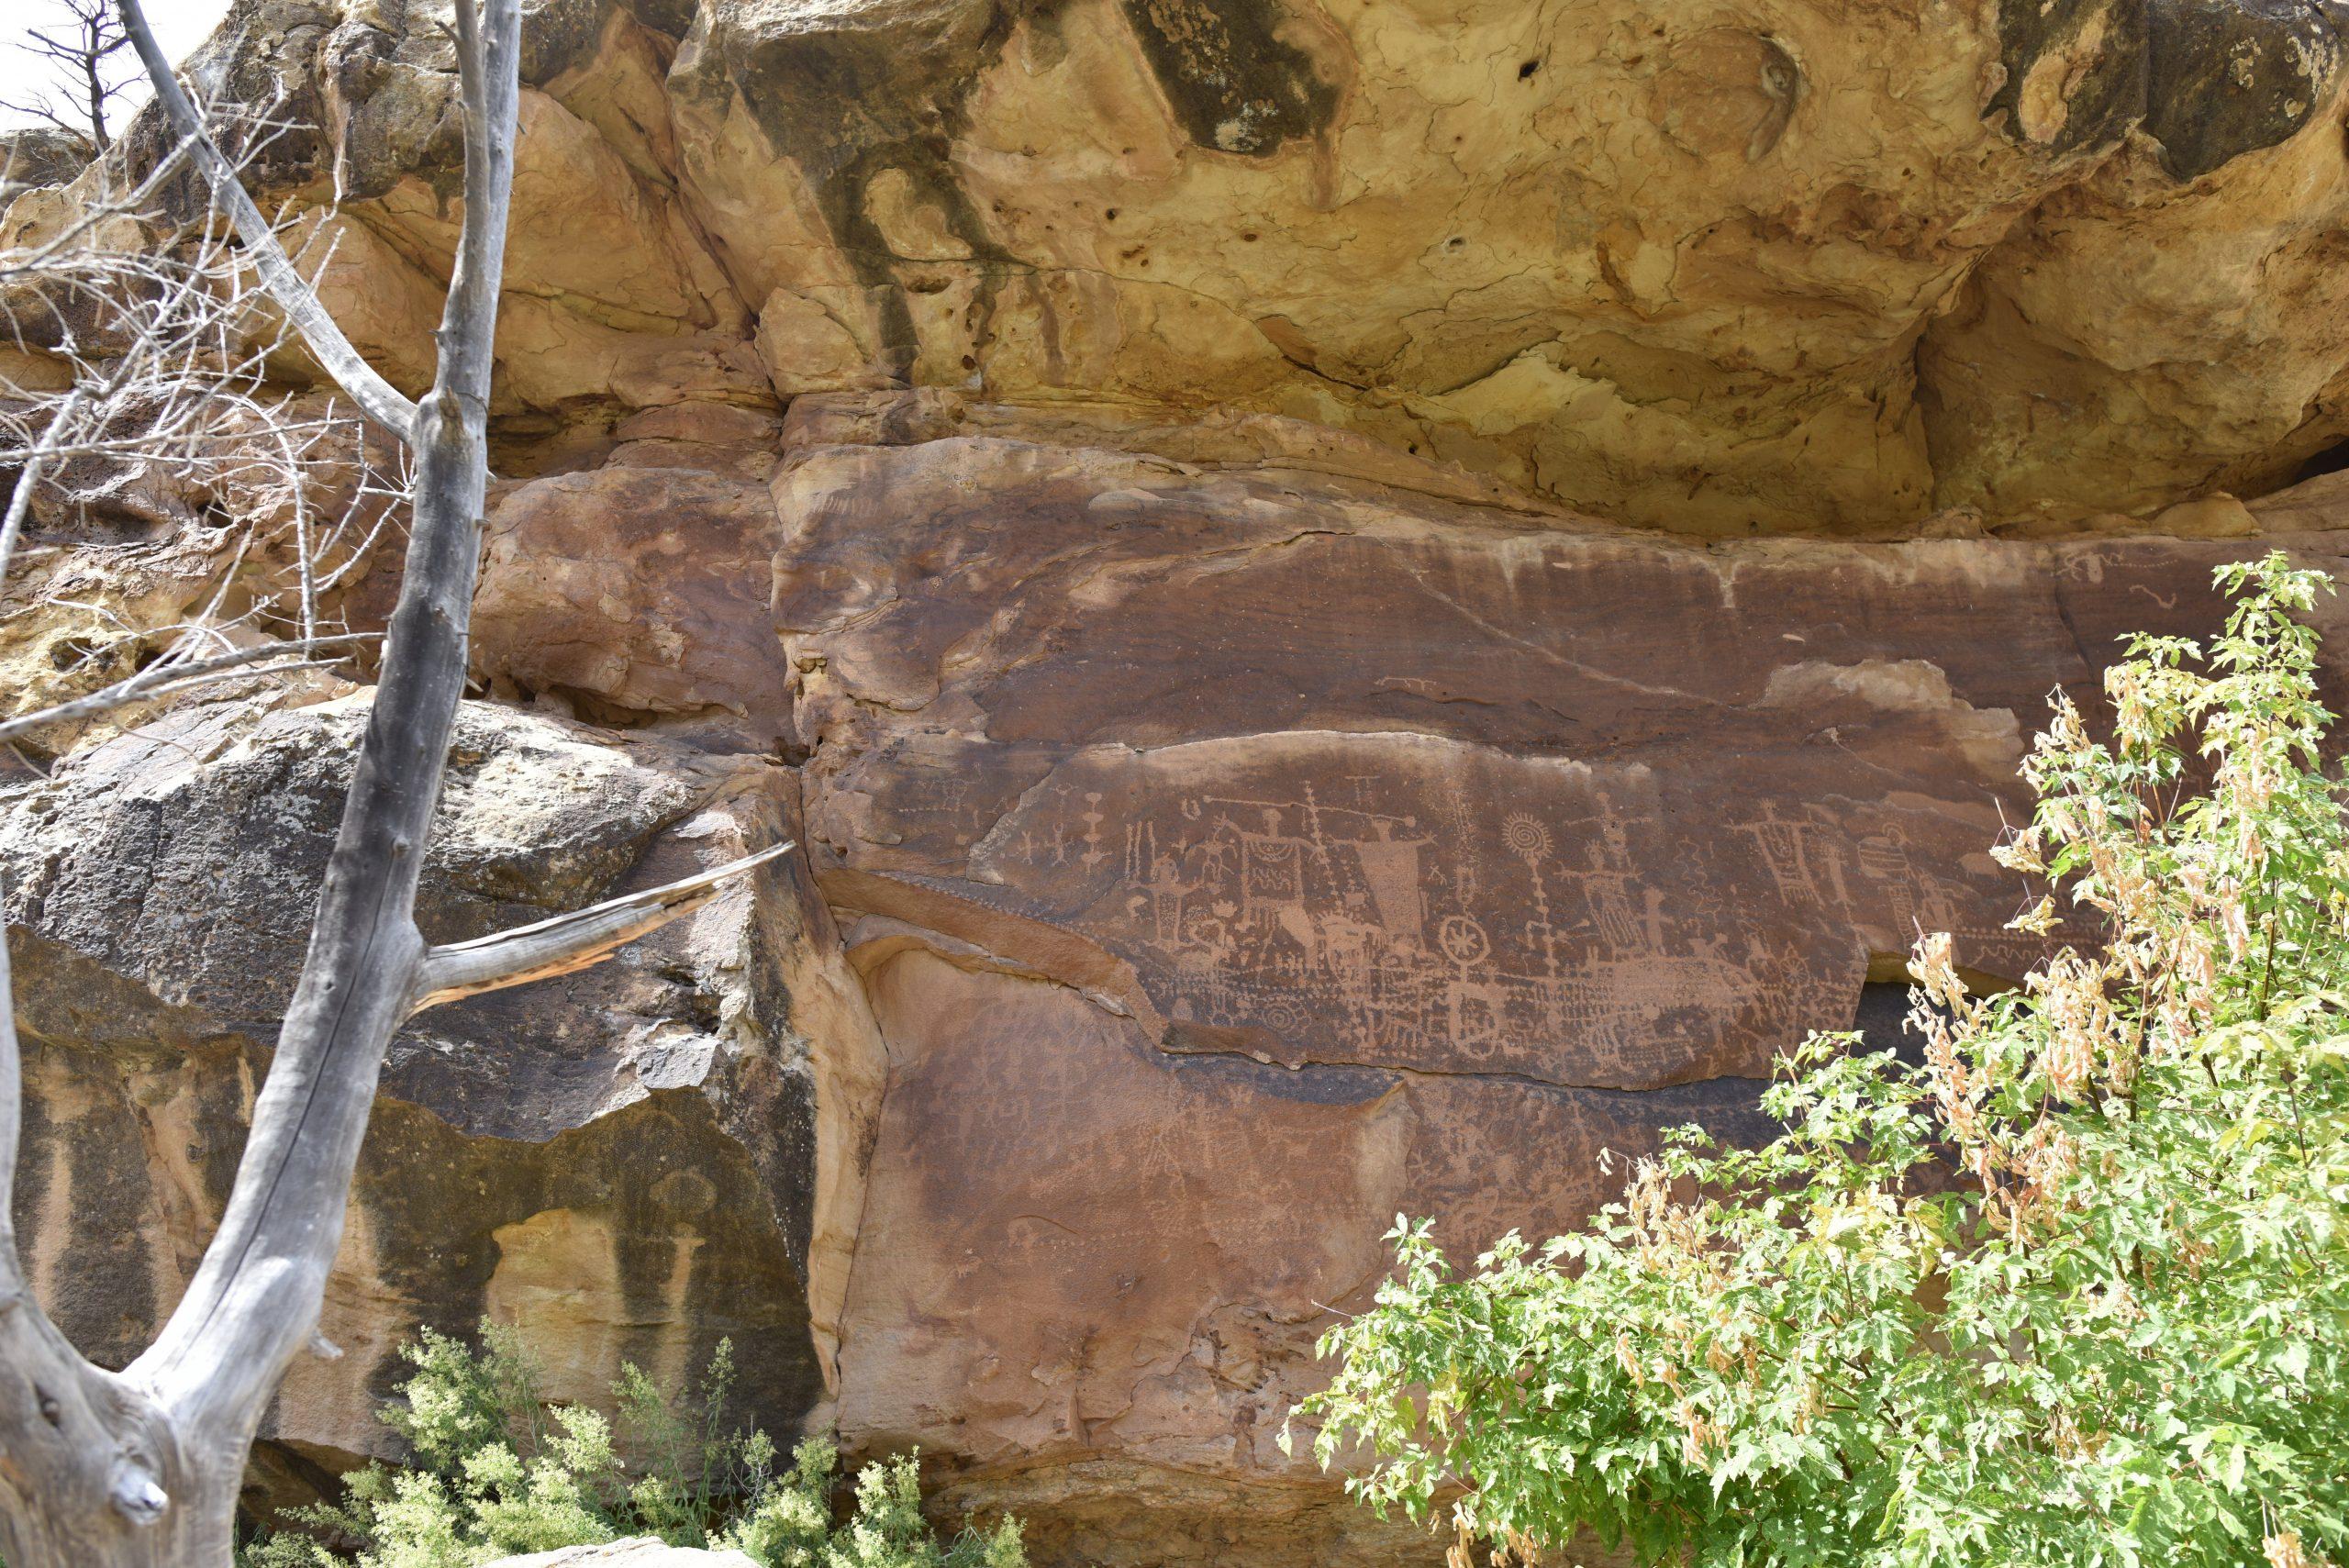 The petroglyph panel at Flat Canyon